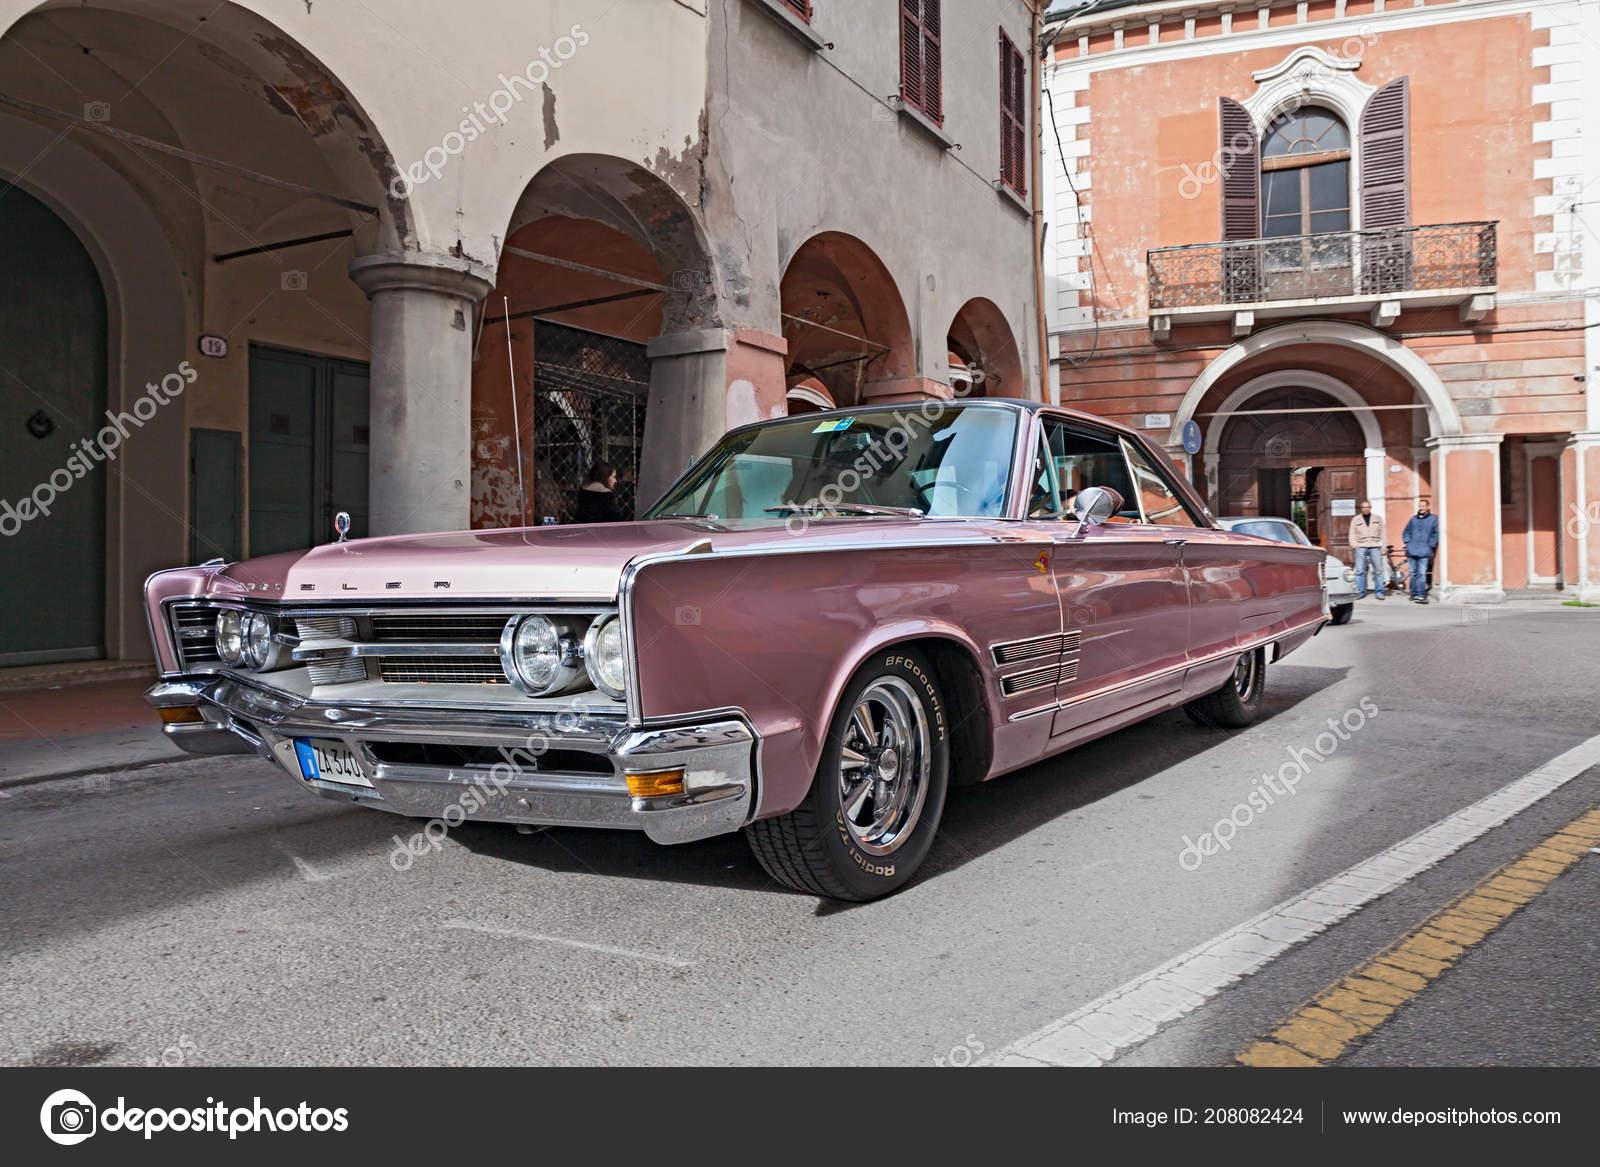 Vintage Car Chrysler 300 Runs City Rally Meeting Fiat 500 Stock